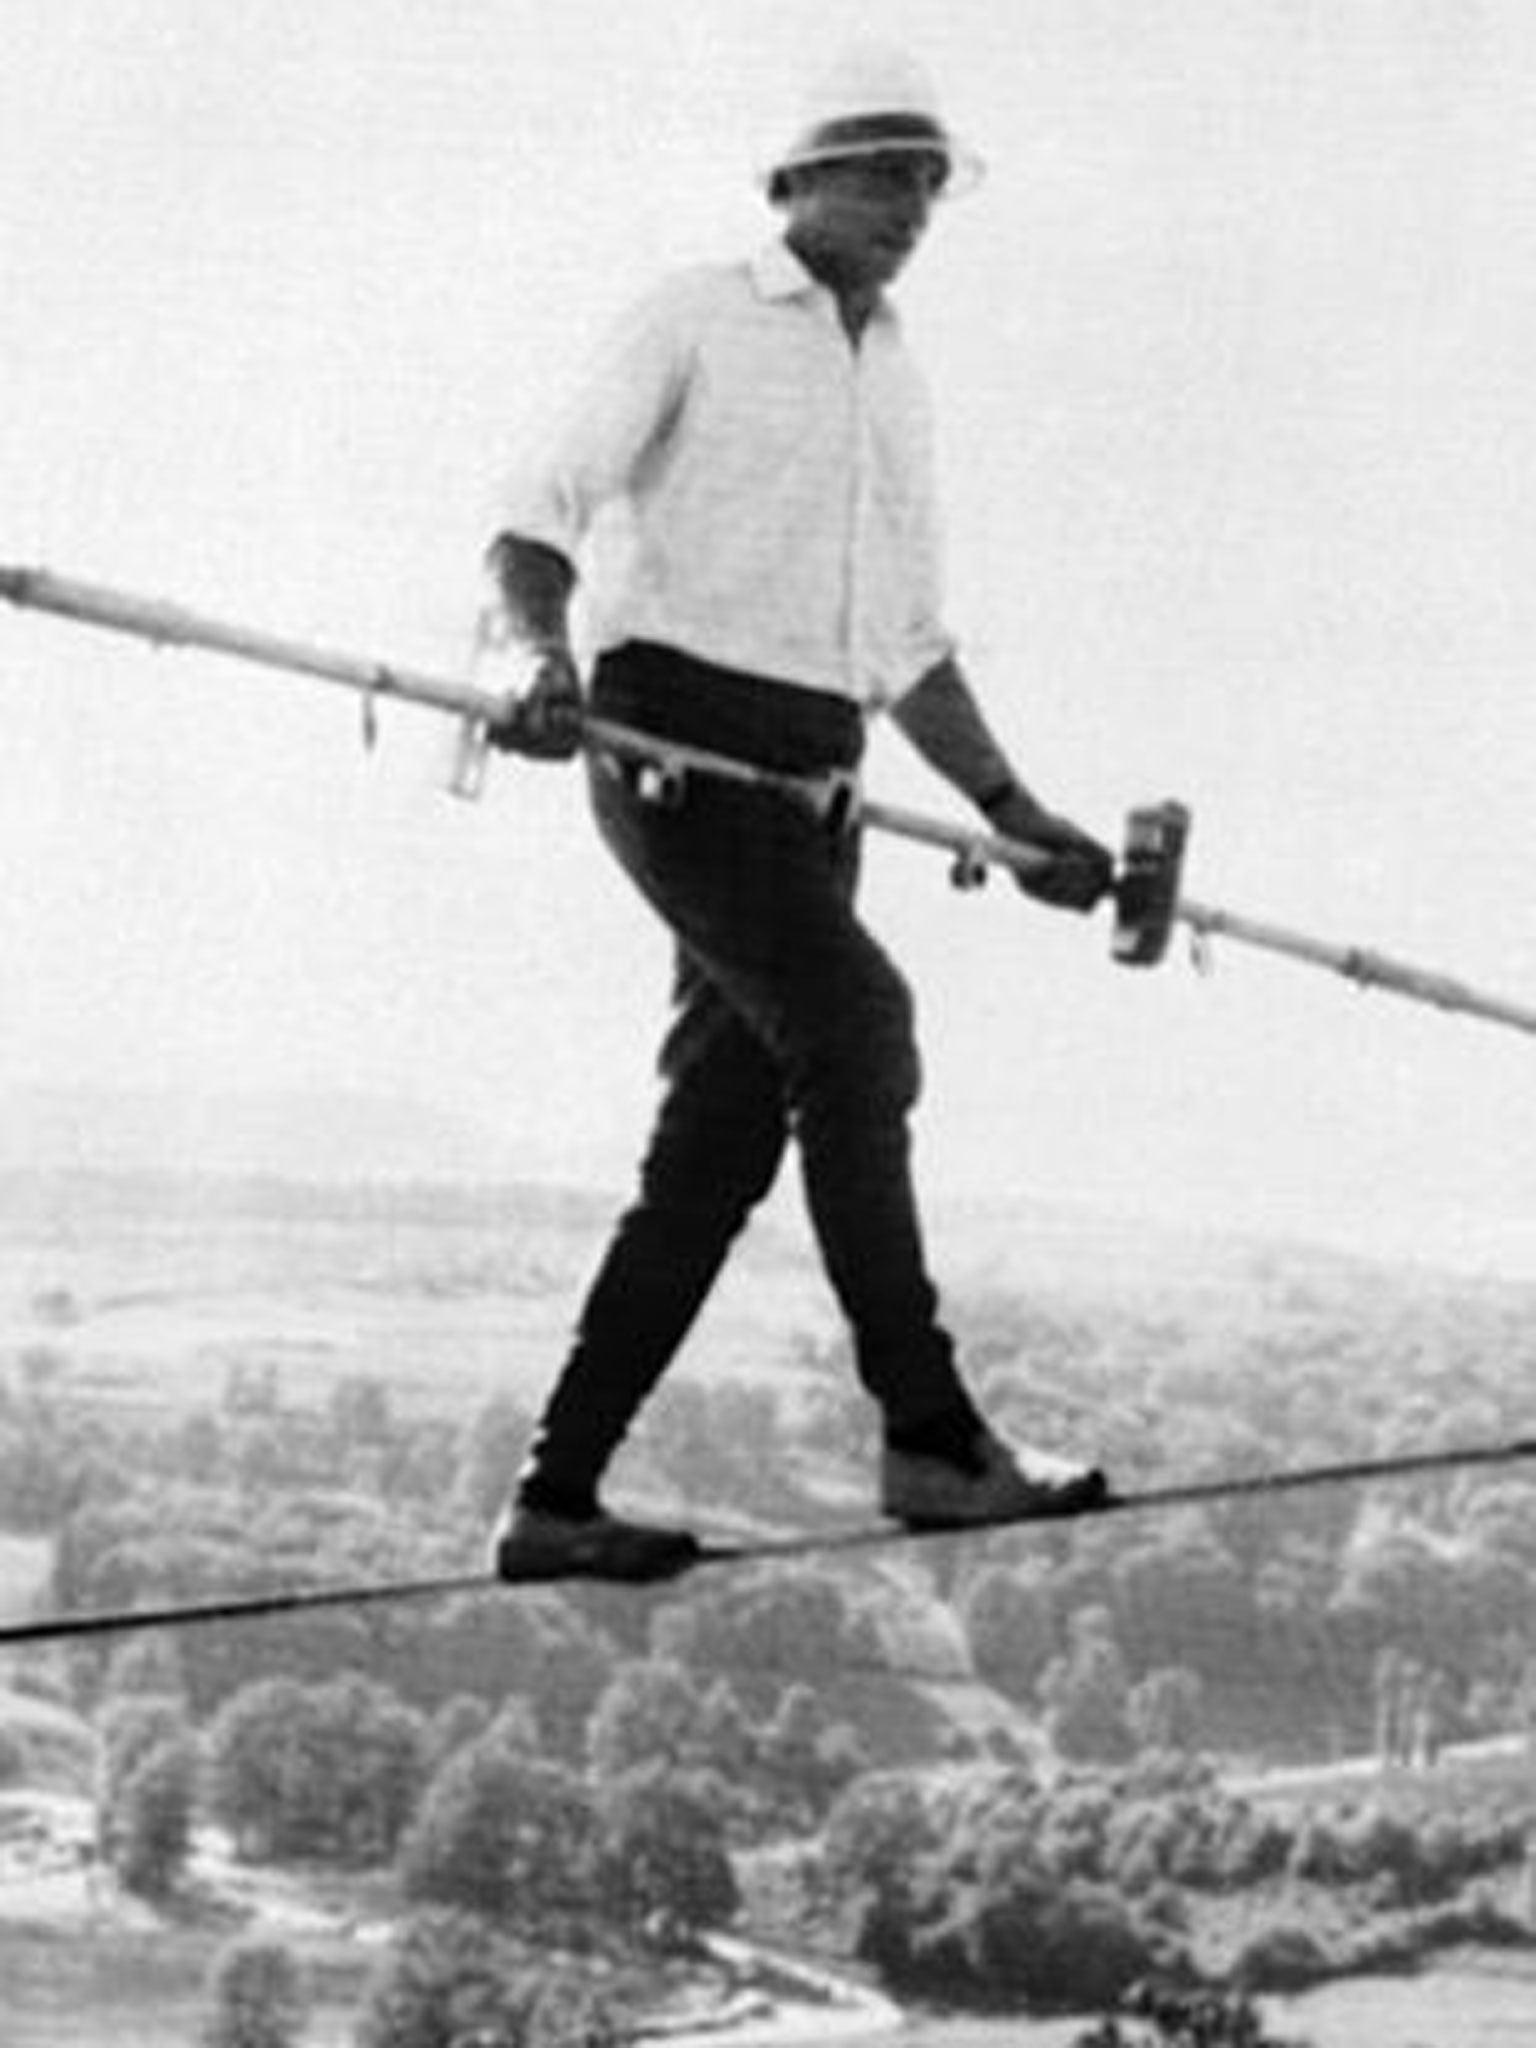 Henri Rechatin: Tightrope walker who traversed Niagara Falls